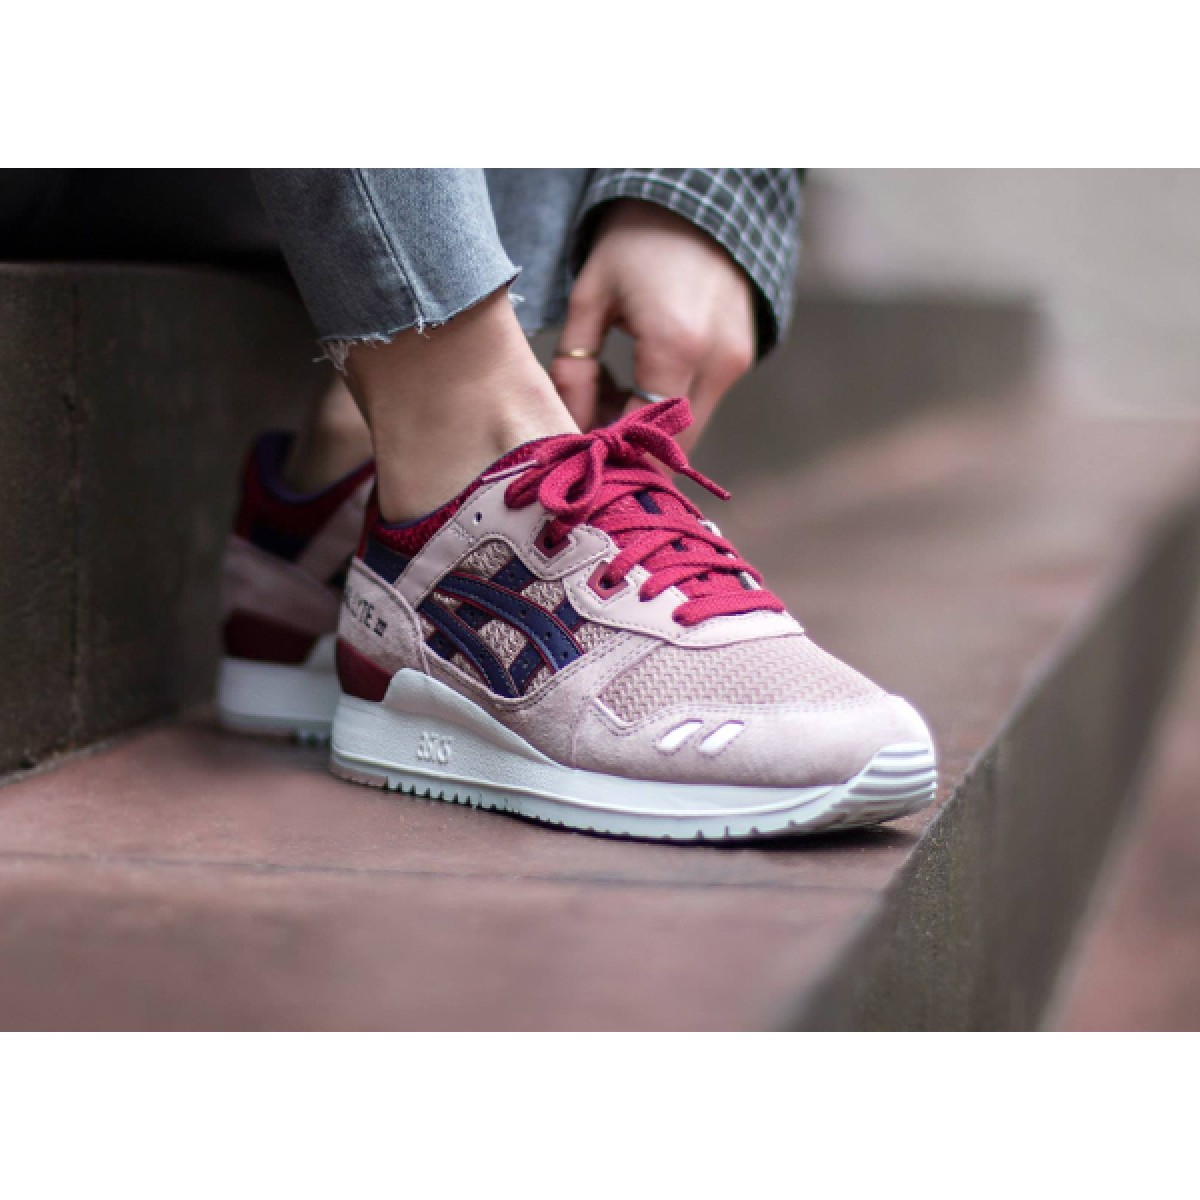 Achat   Vente produits Asics Gel Lyte 3 Femme Beige,Professionnel Courir Chaussures  Asics Gel 895a1a221c29